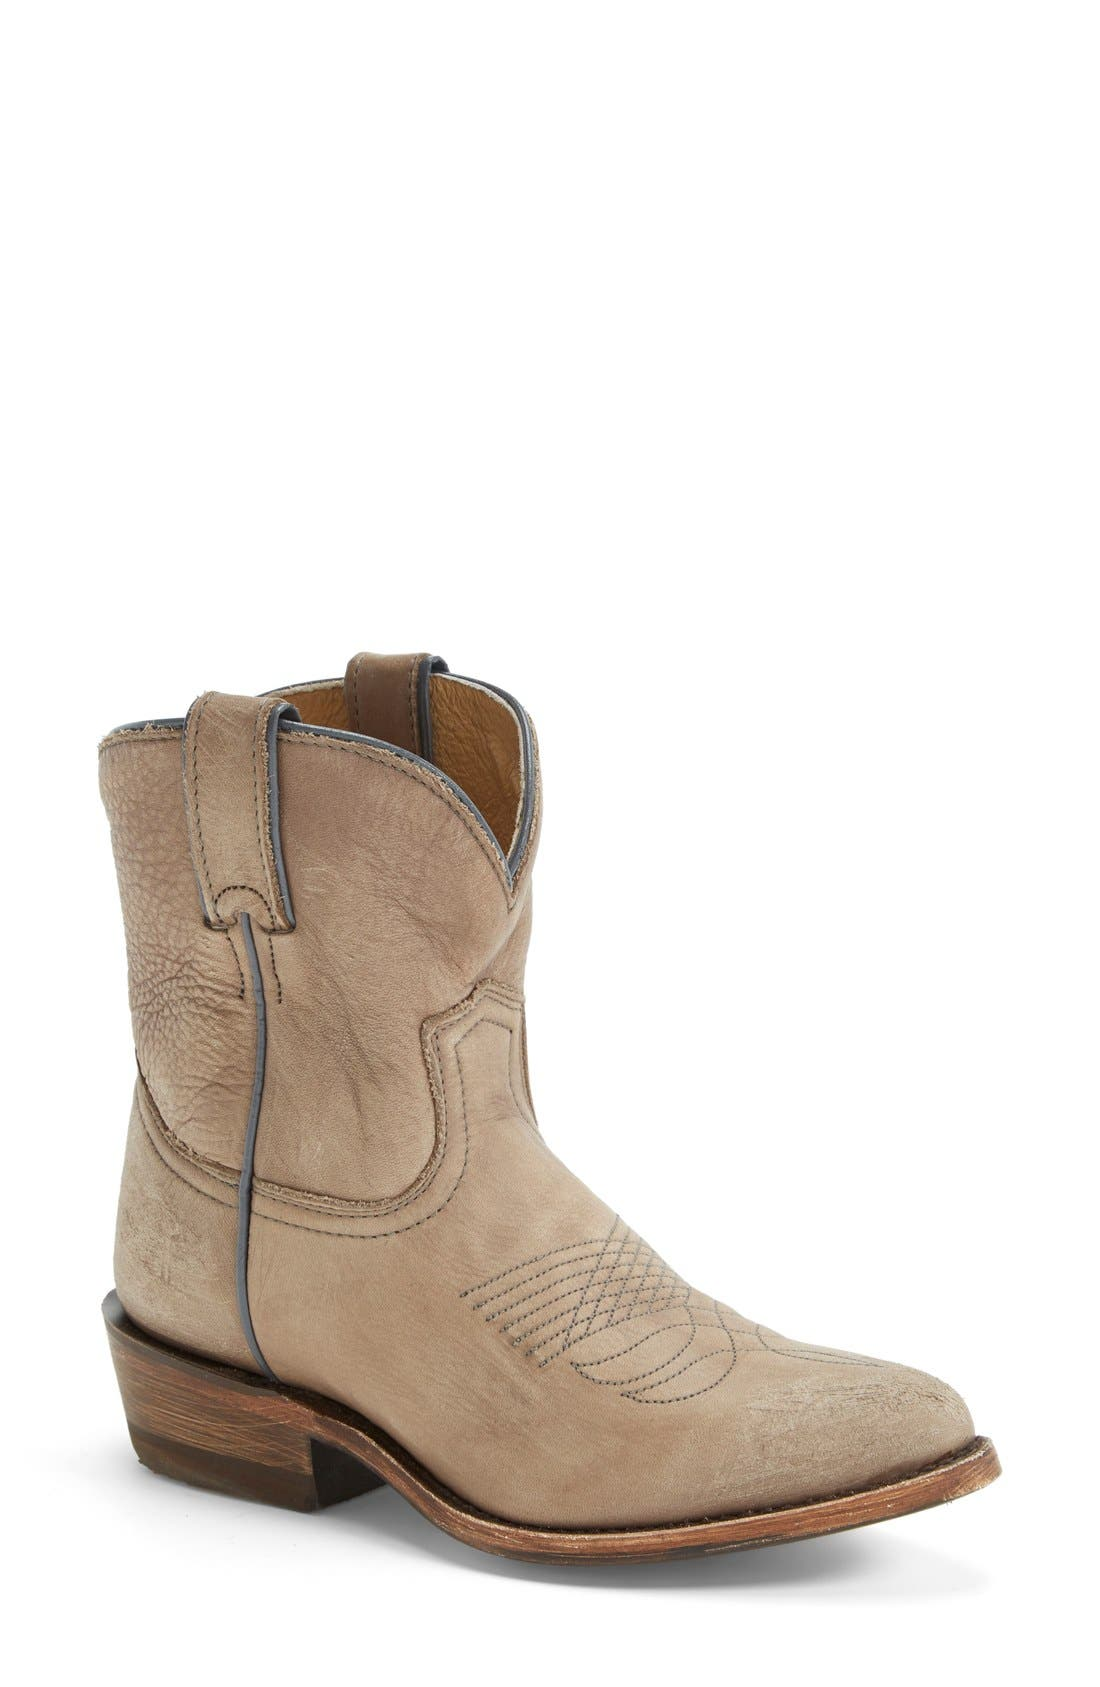 Main Image - Frye 'Billy' Short Boot (Women)